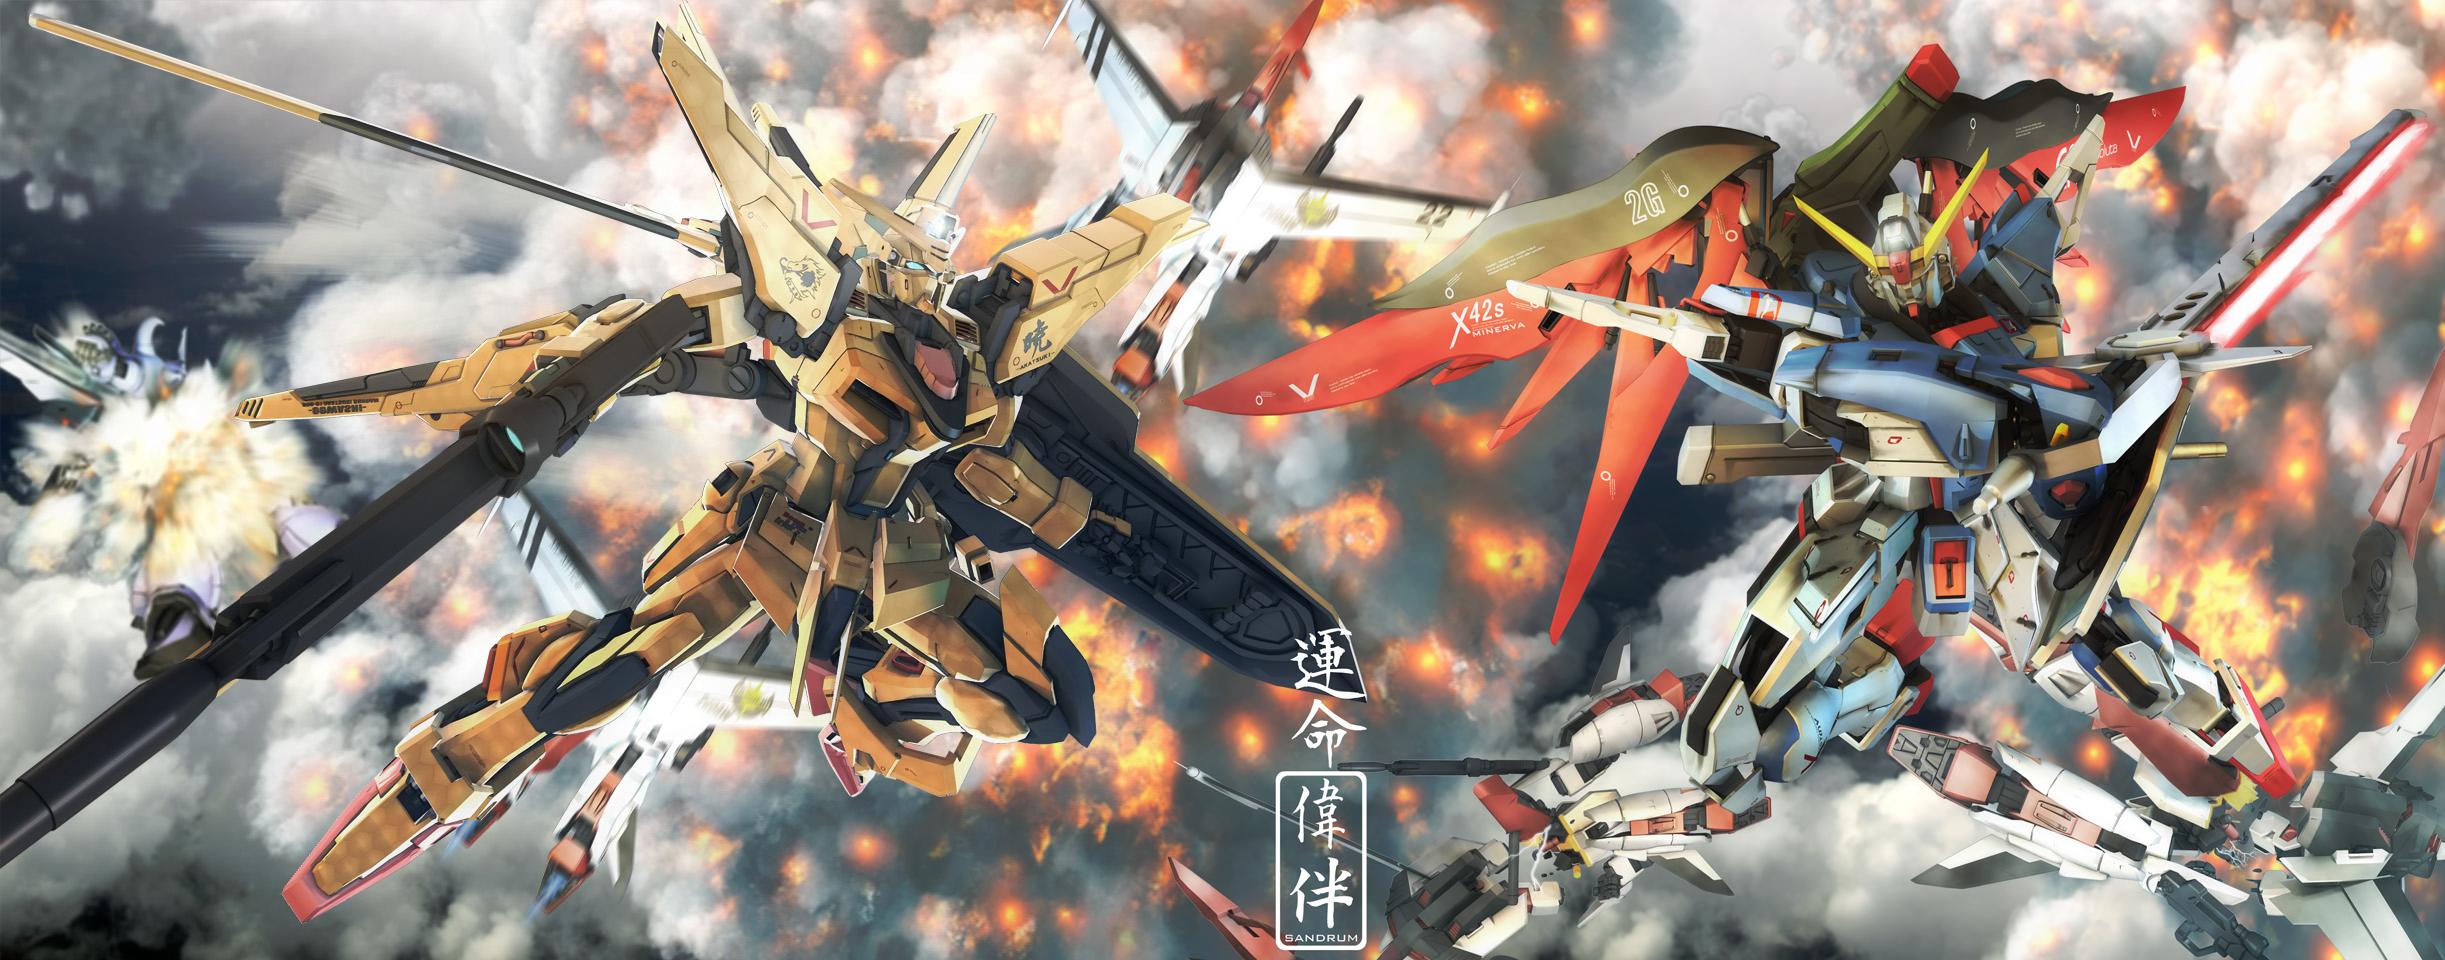 dual screens akatsuki gundam destiny desktop 2445x960 hd wallpaper 2445x960